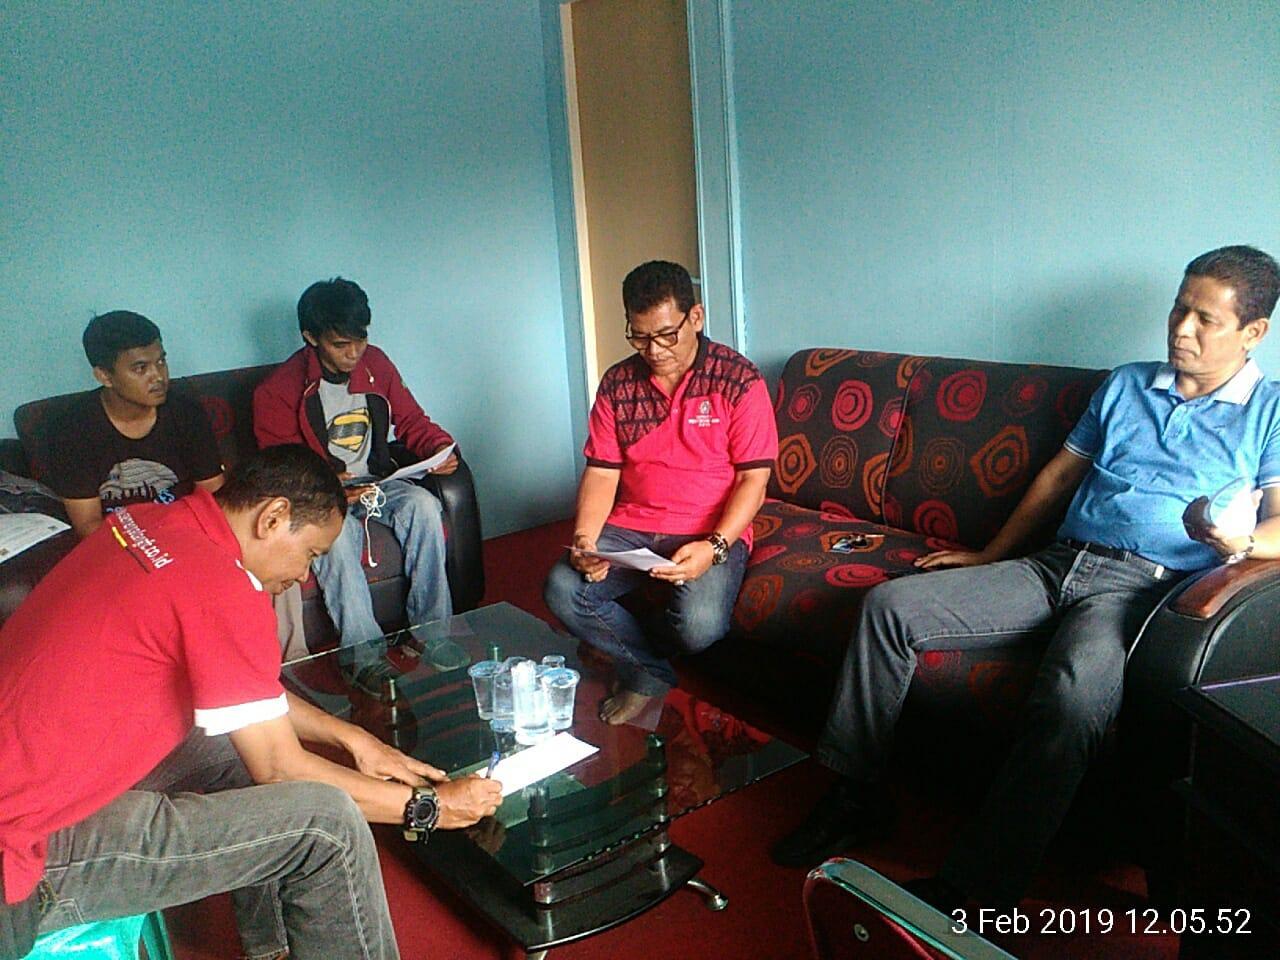 Sebelas Tim U-40 Berebut Piala Indra Dt Rajo Lelo